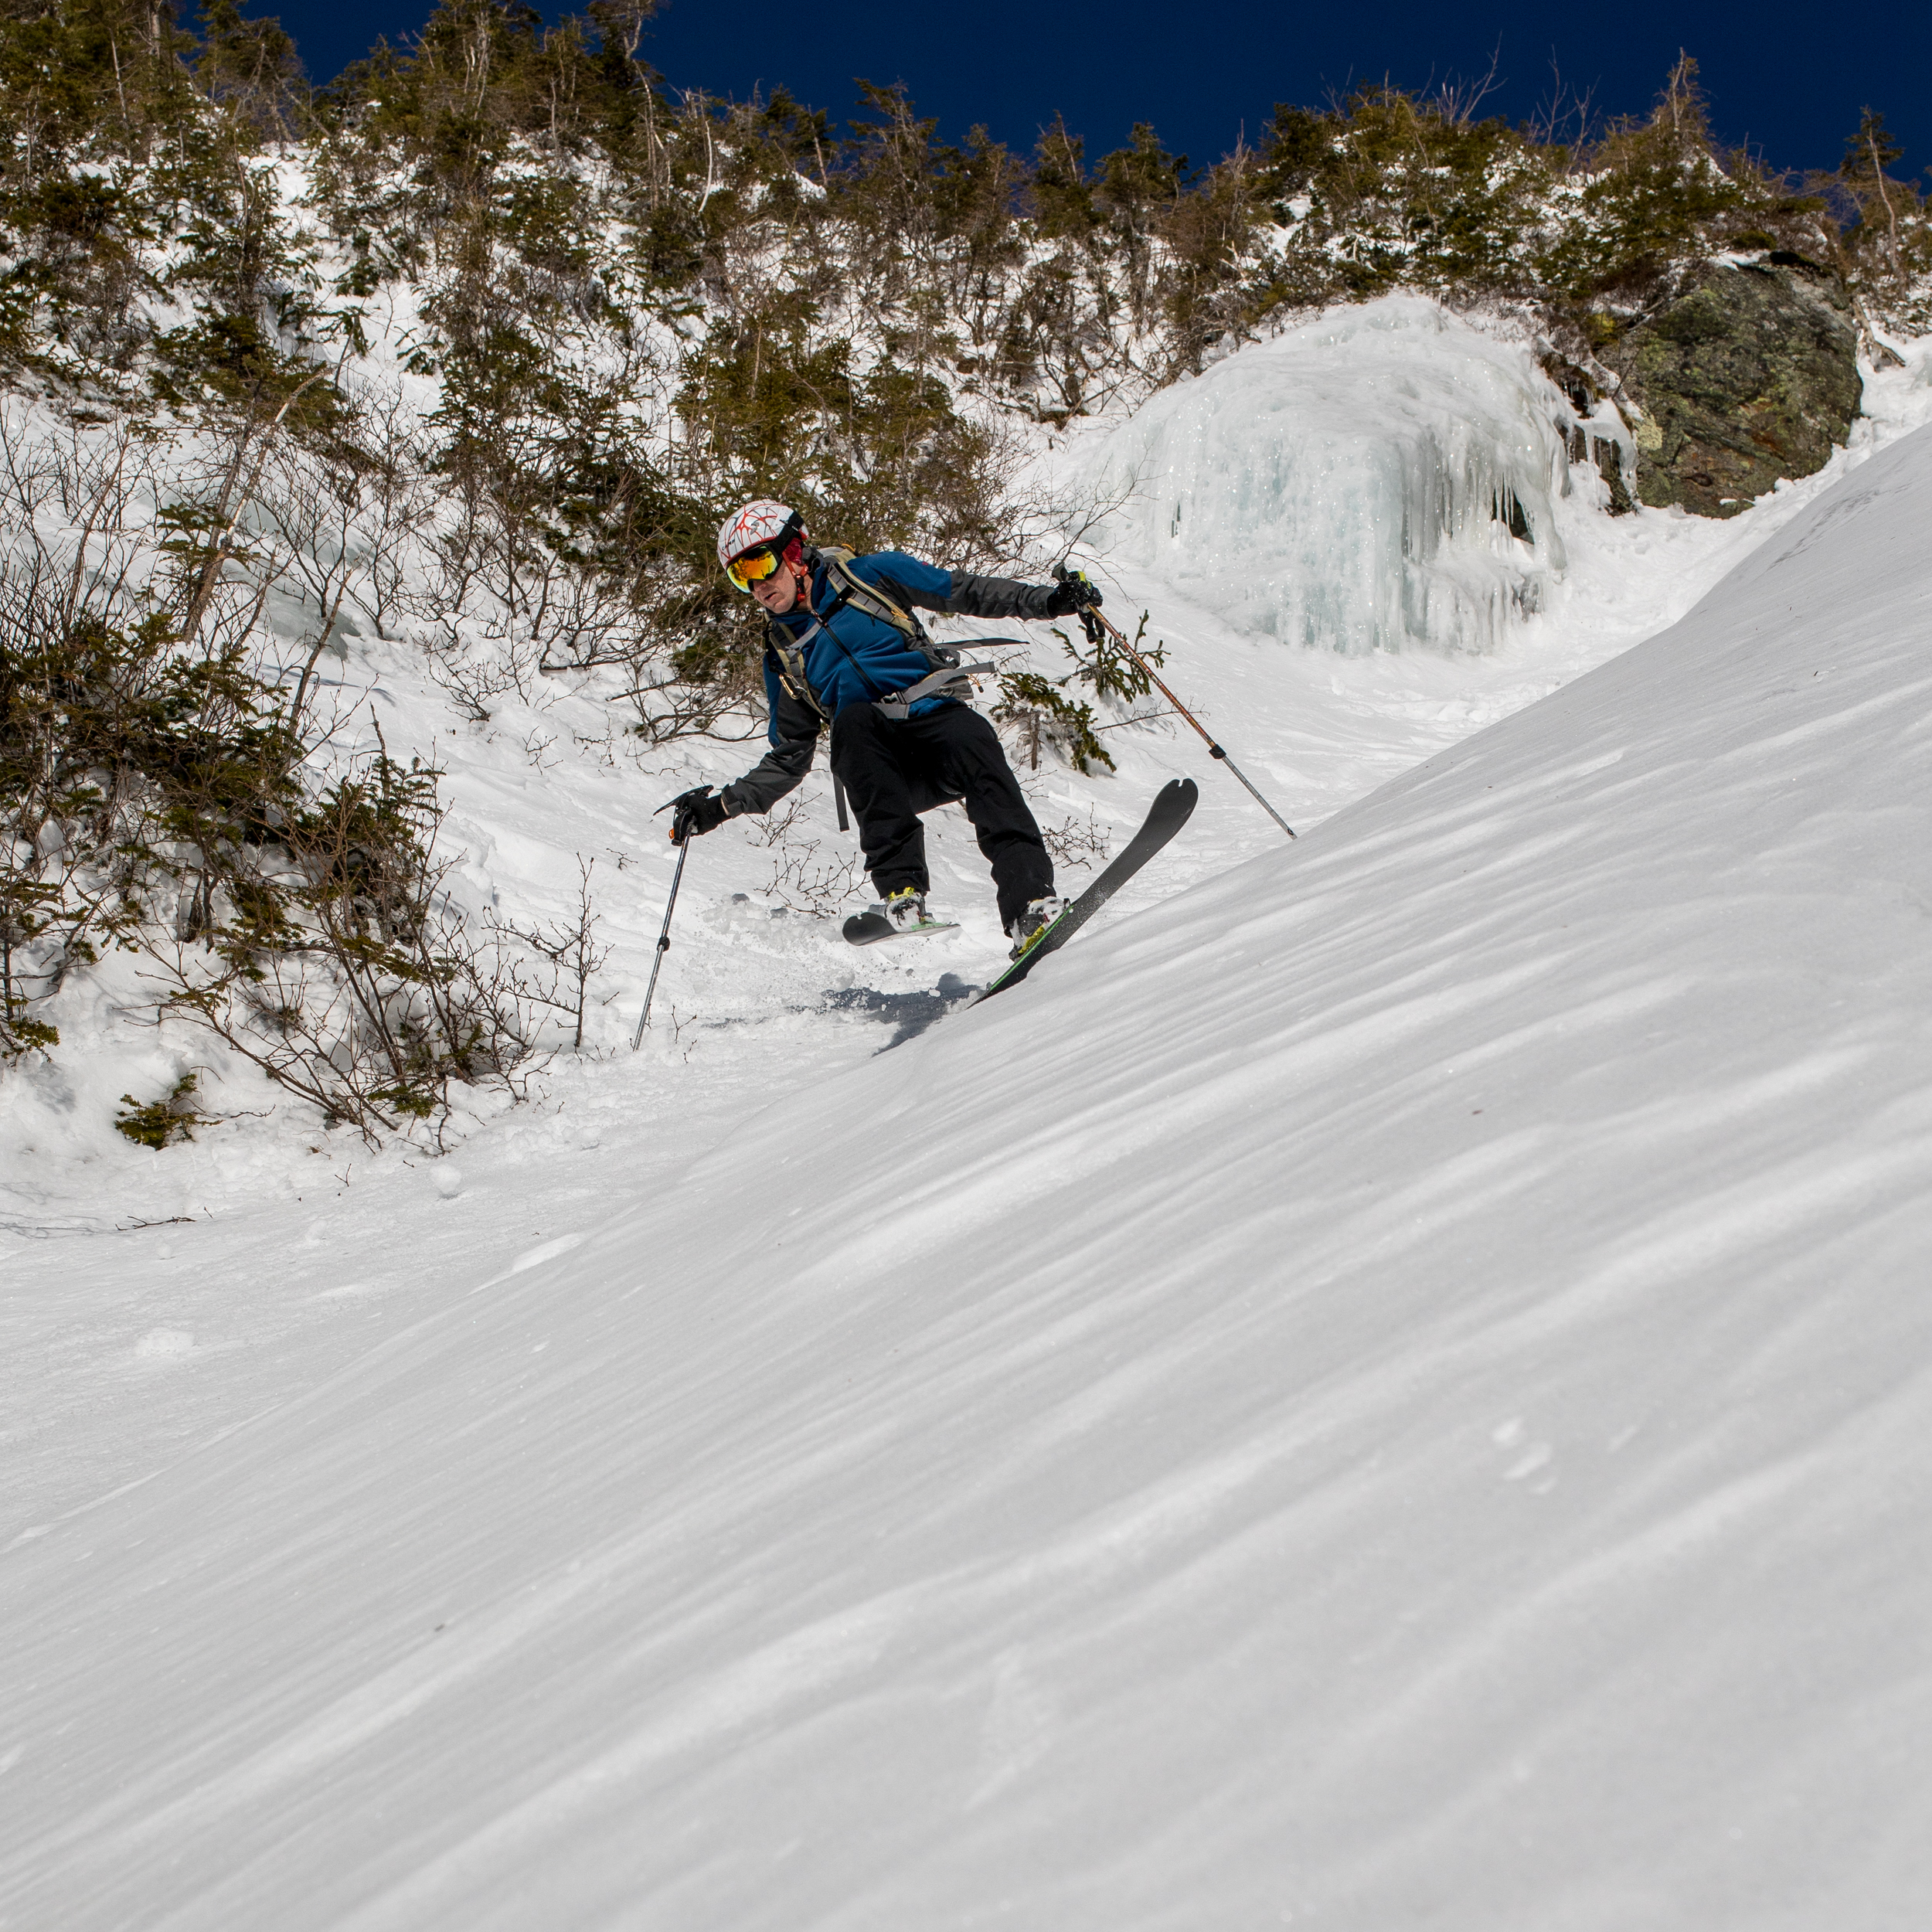 Skier Hop Turn Jerimy Arnold White Mountains.jpg